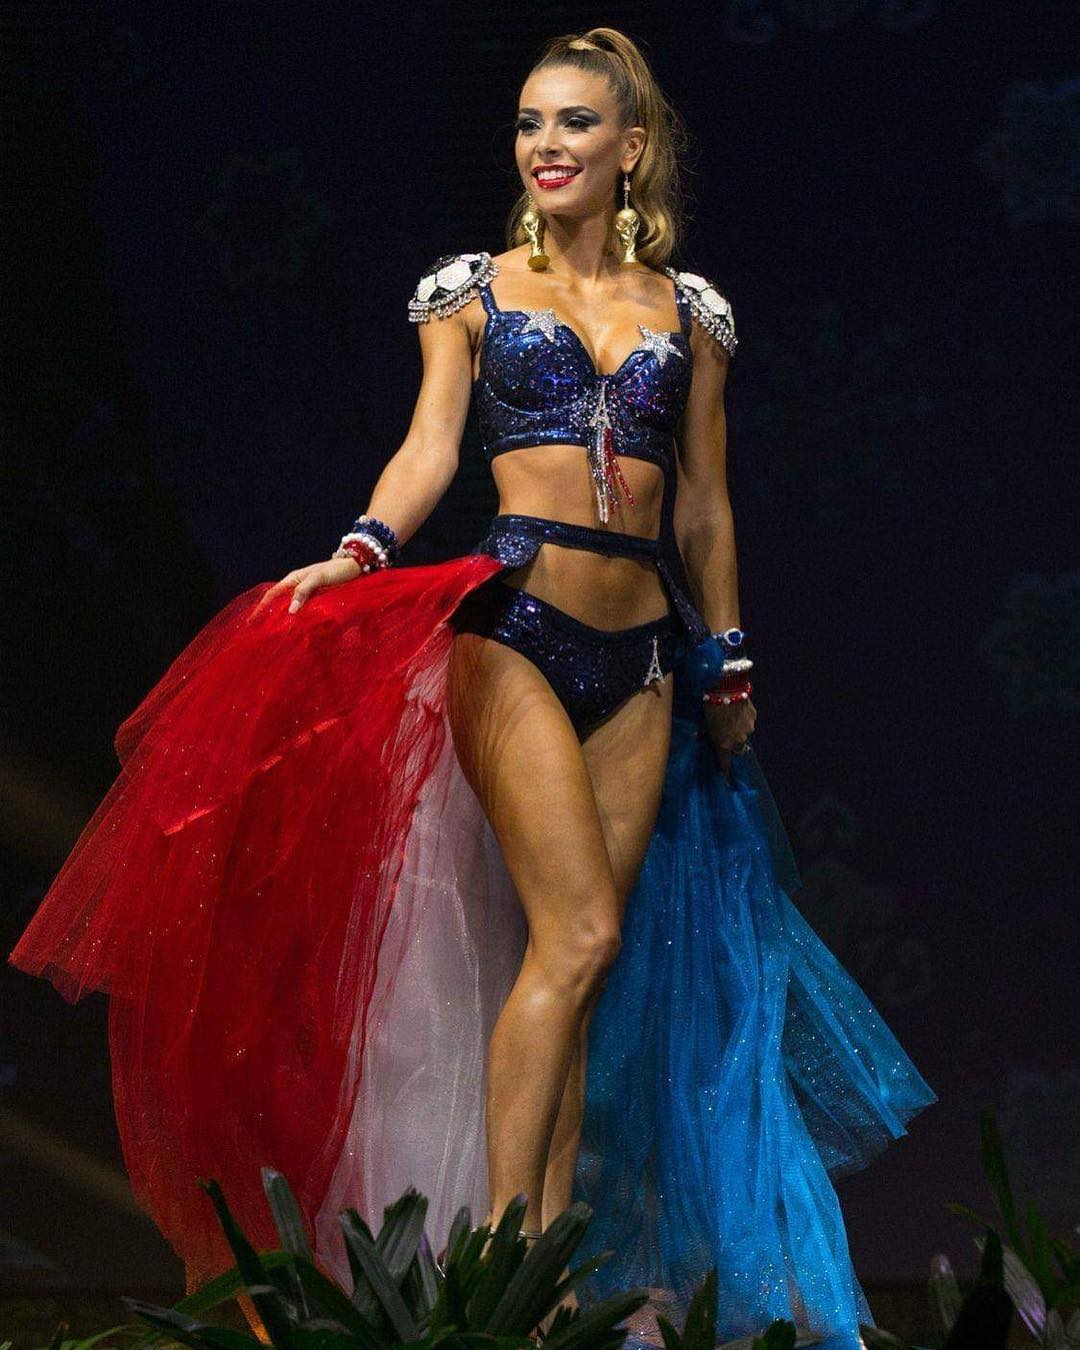 trajes tipicos de candidatas a miss universe 2018. - Página 11 Pkaat8sx